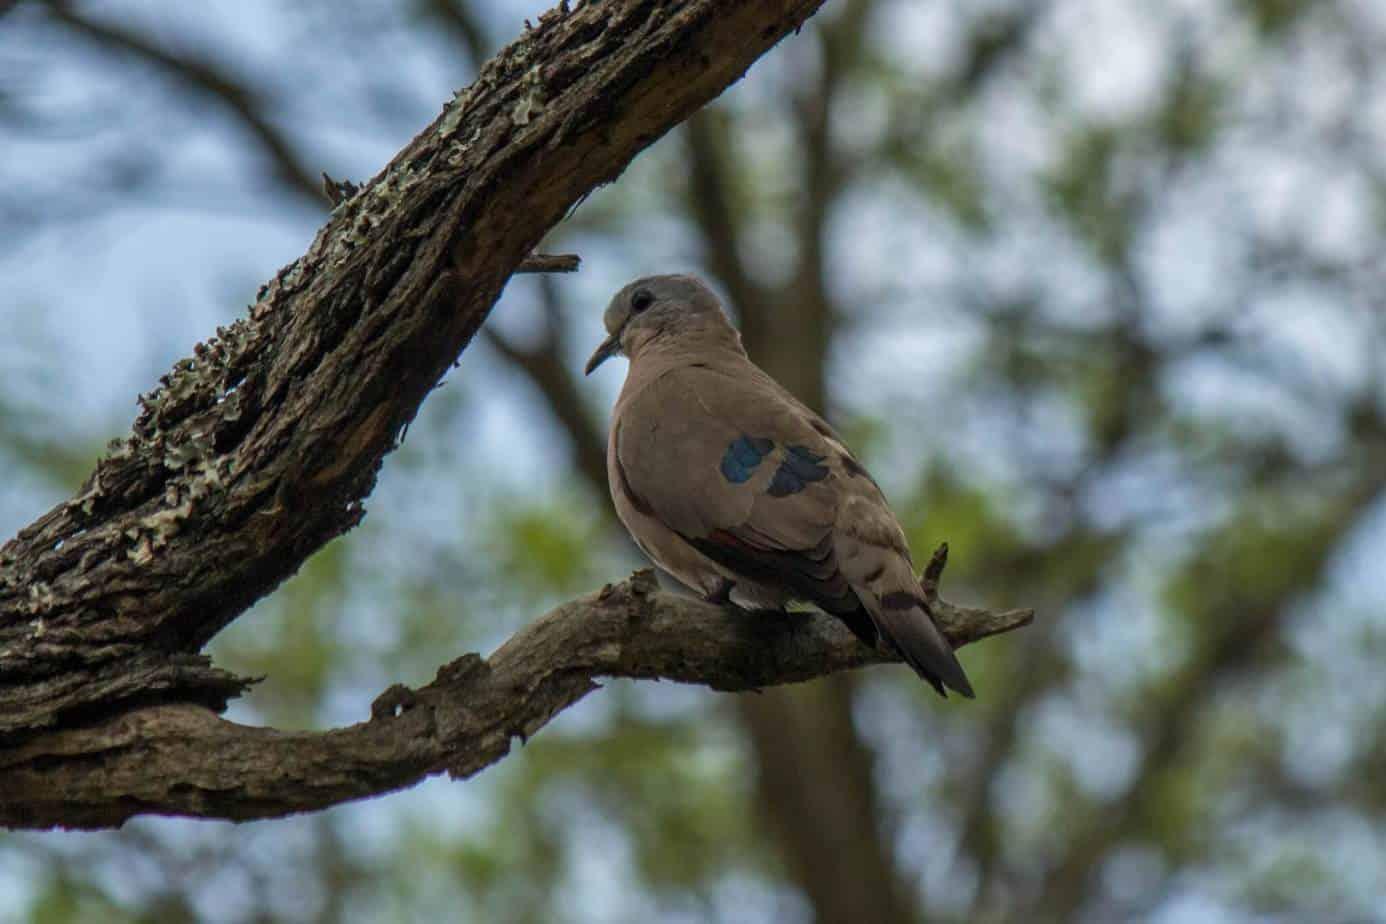 Emerald-Spotted Wood Dove @ Ndumo Game Reserve. Photo: Håvard Rosenlund